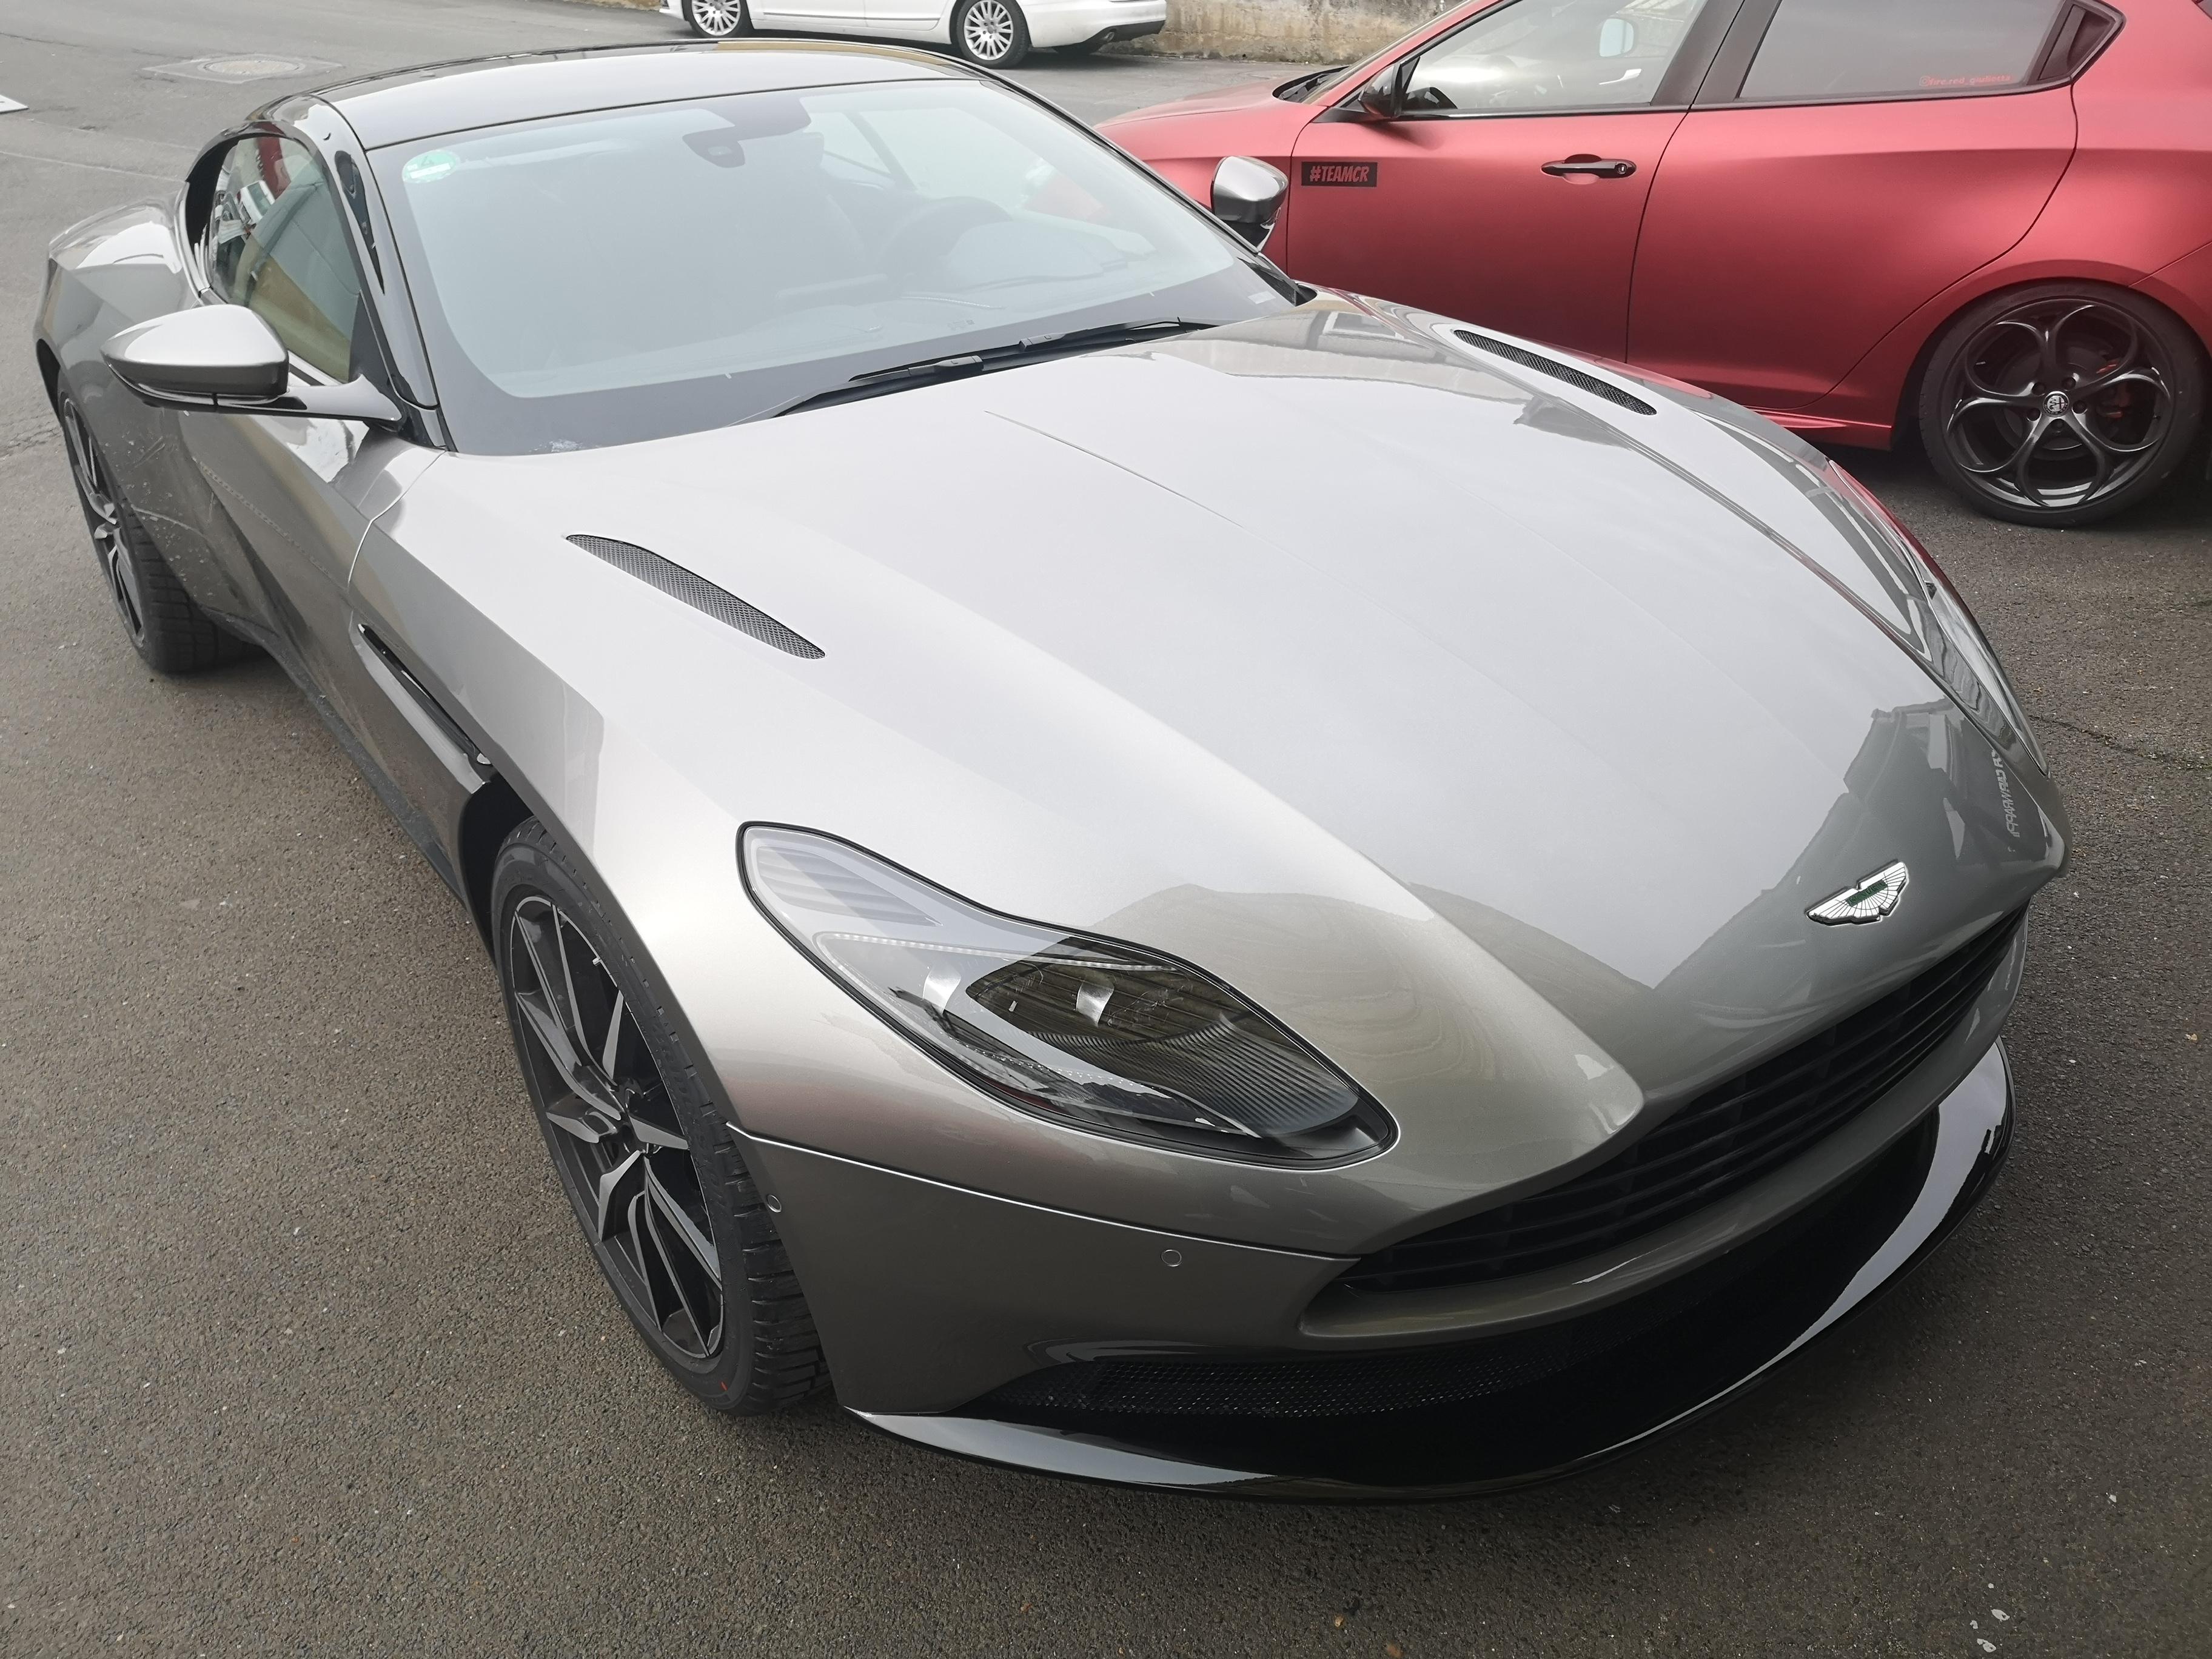 Aston Martin DB11 XPEL Lackschutzfolie